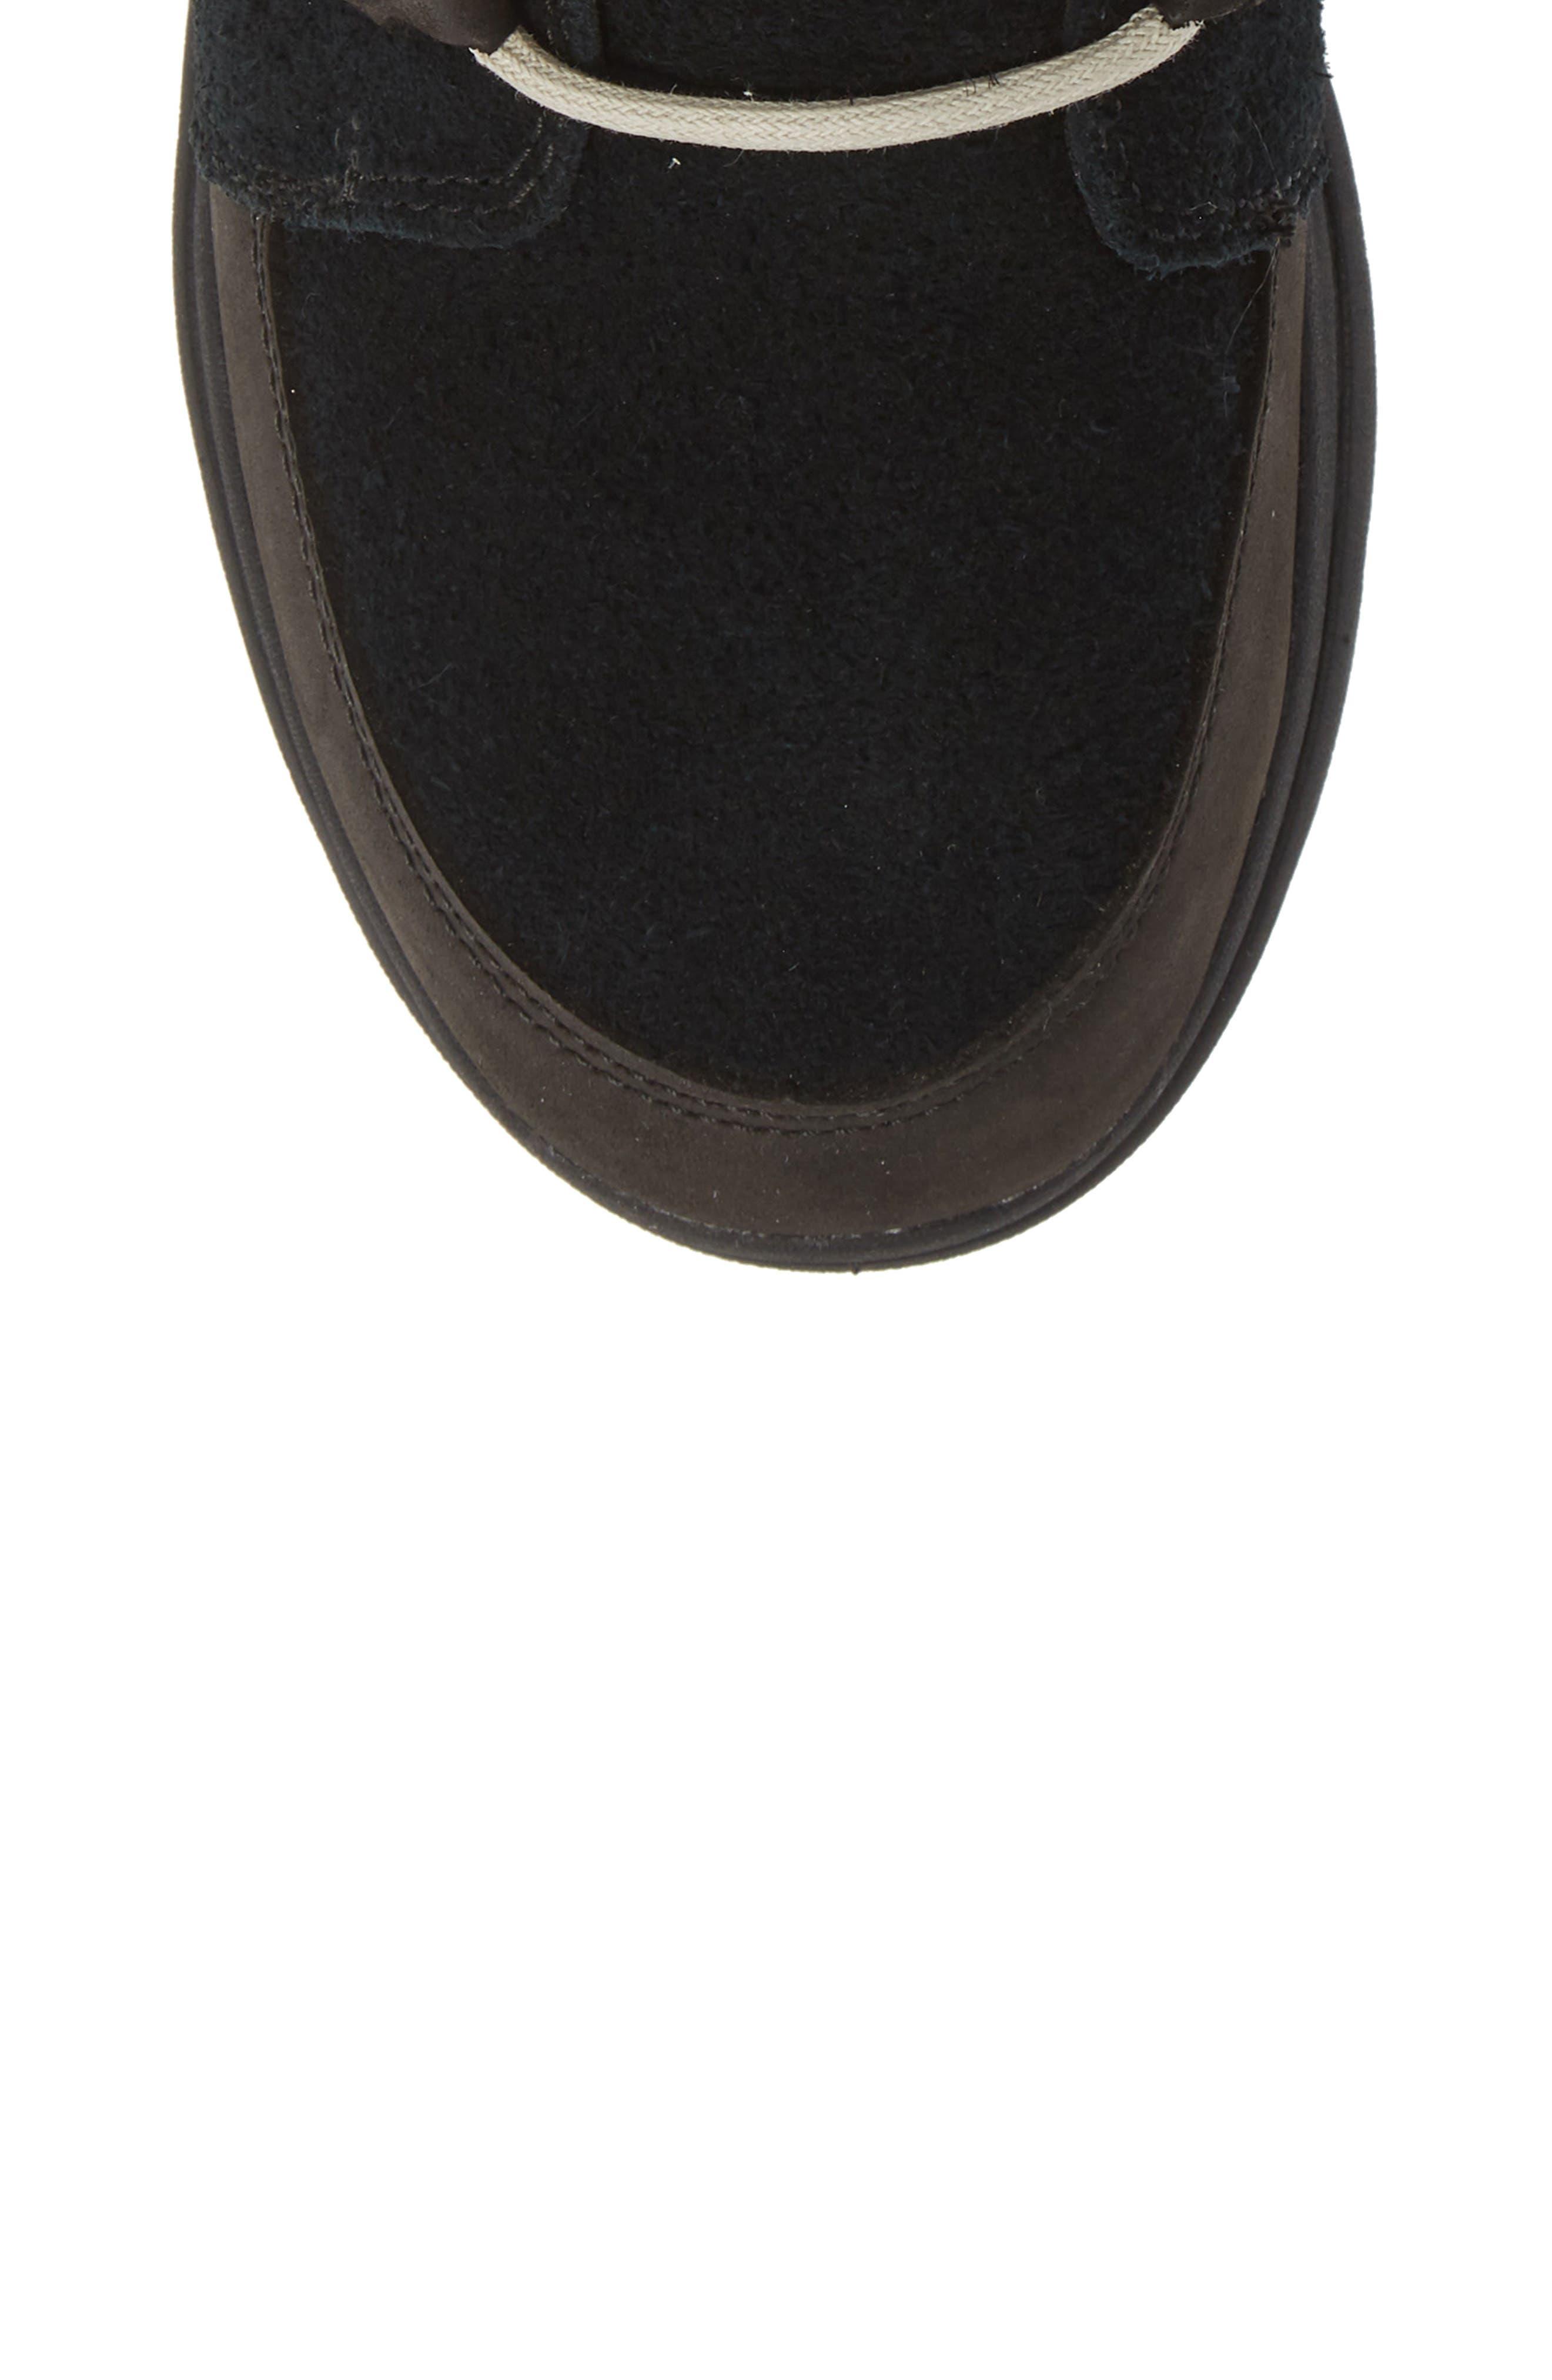 Explorer Joan Waterproof Boot with Faux Fur Collar,                             Alternate thumbnail 5, color,                             BLACK/ DARK STONE